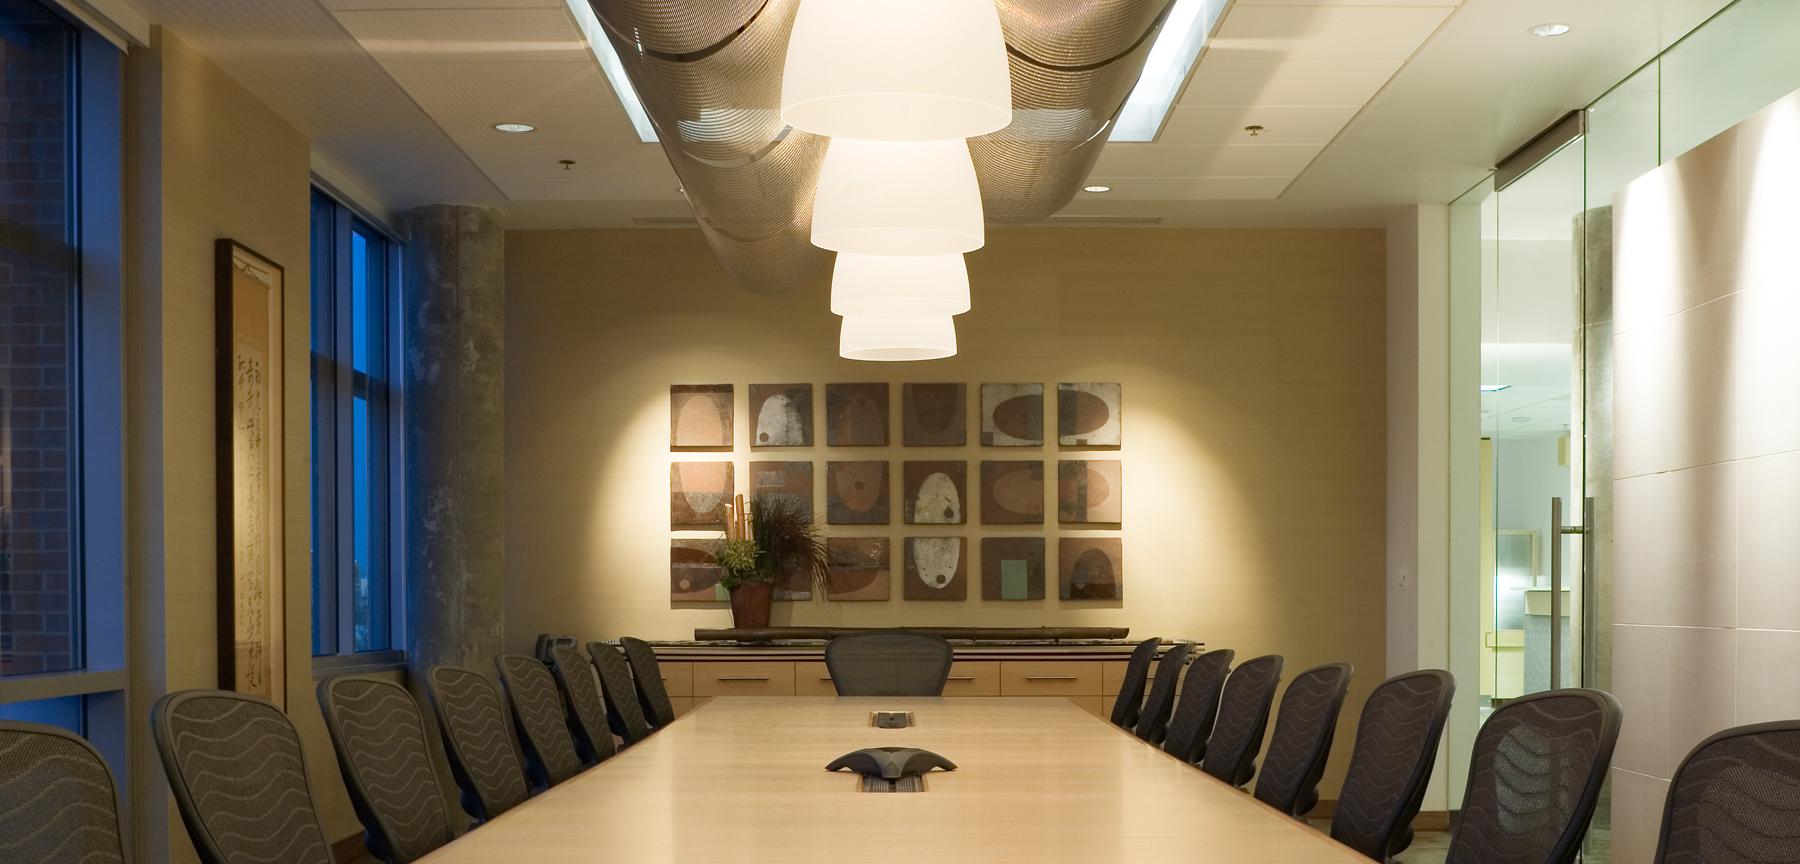 McGeady Sisneros conference room